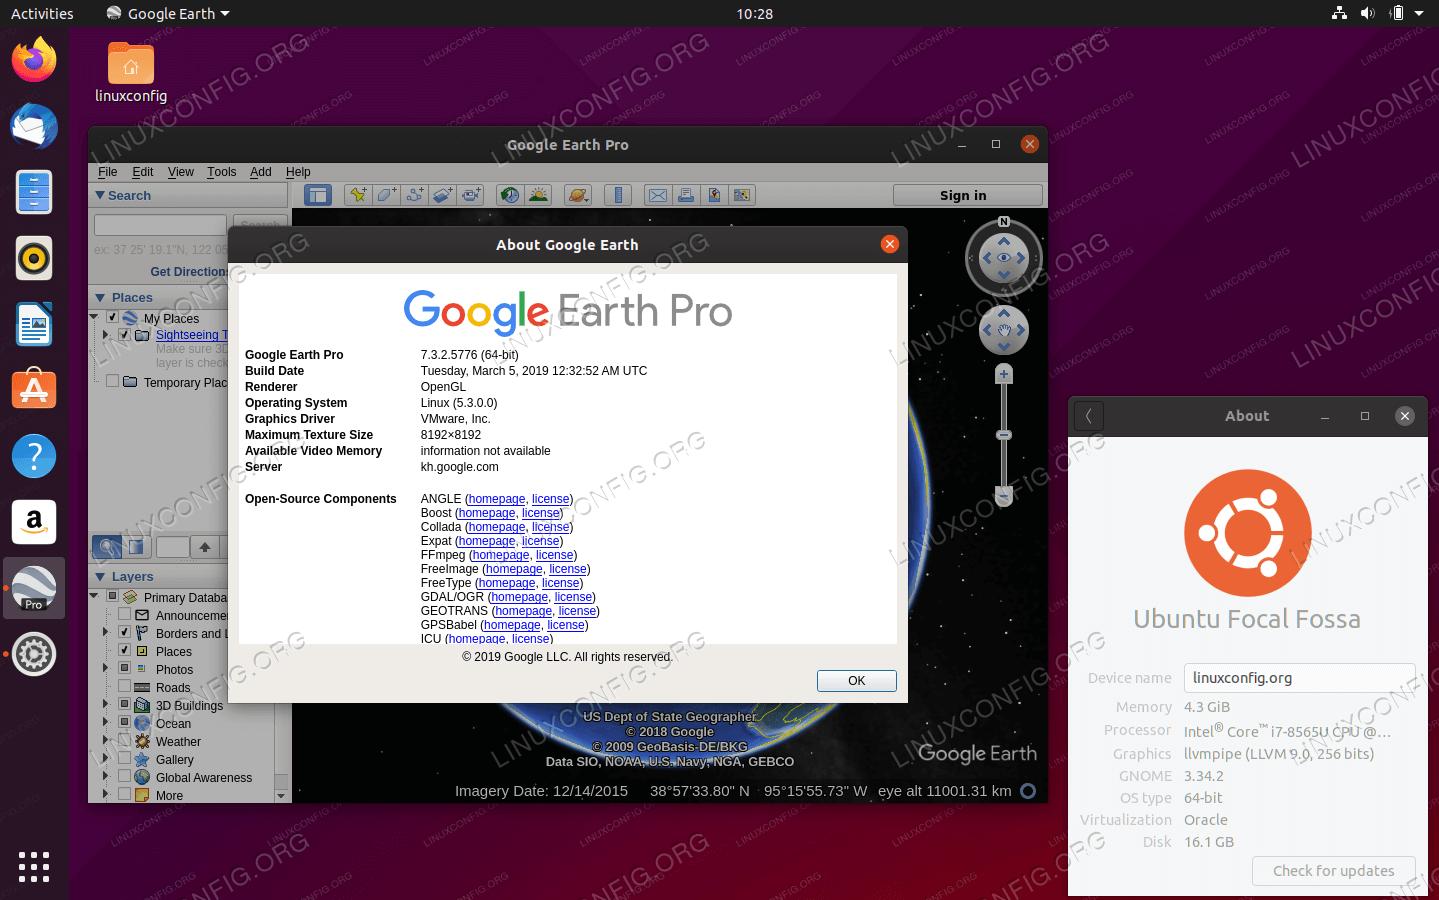 Google Earth on Ubuntu 20.04 Focal Fossa Linux